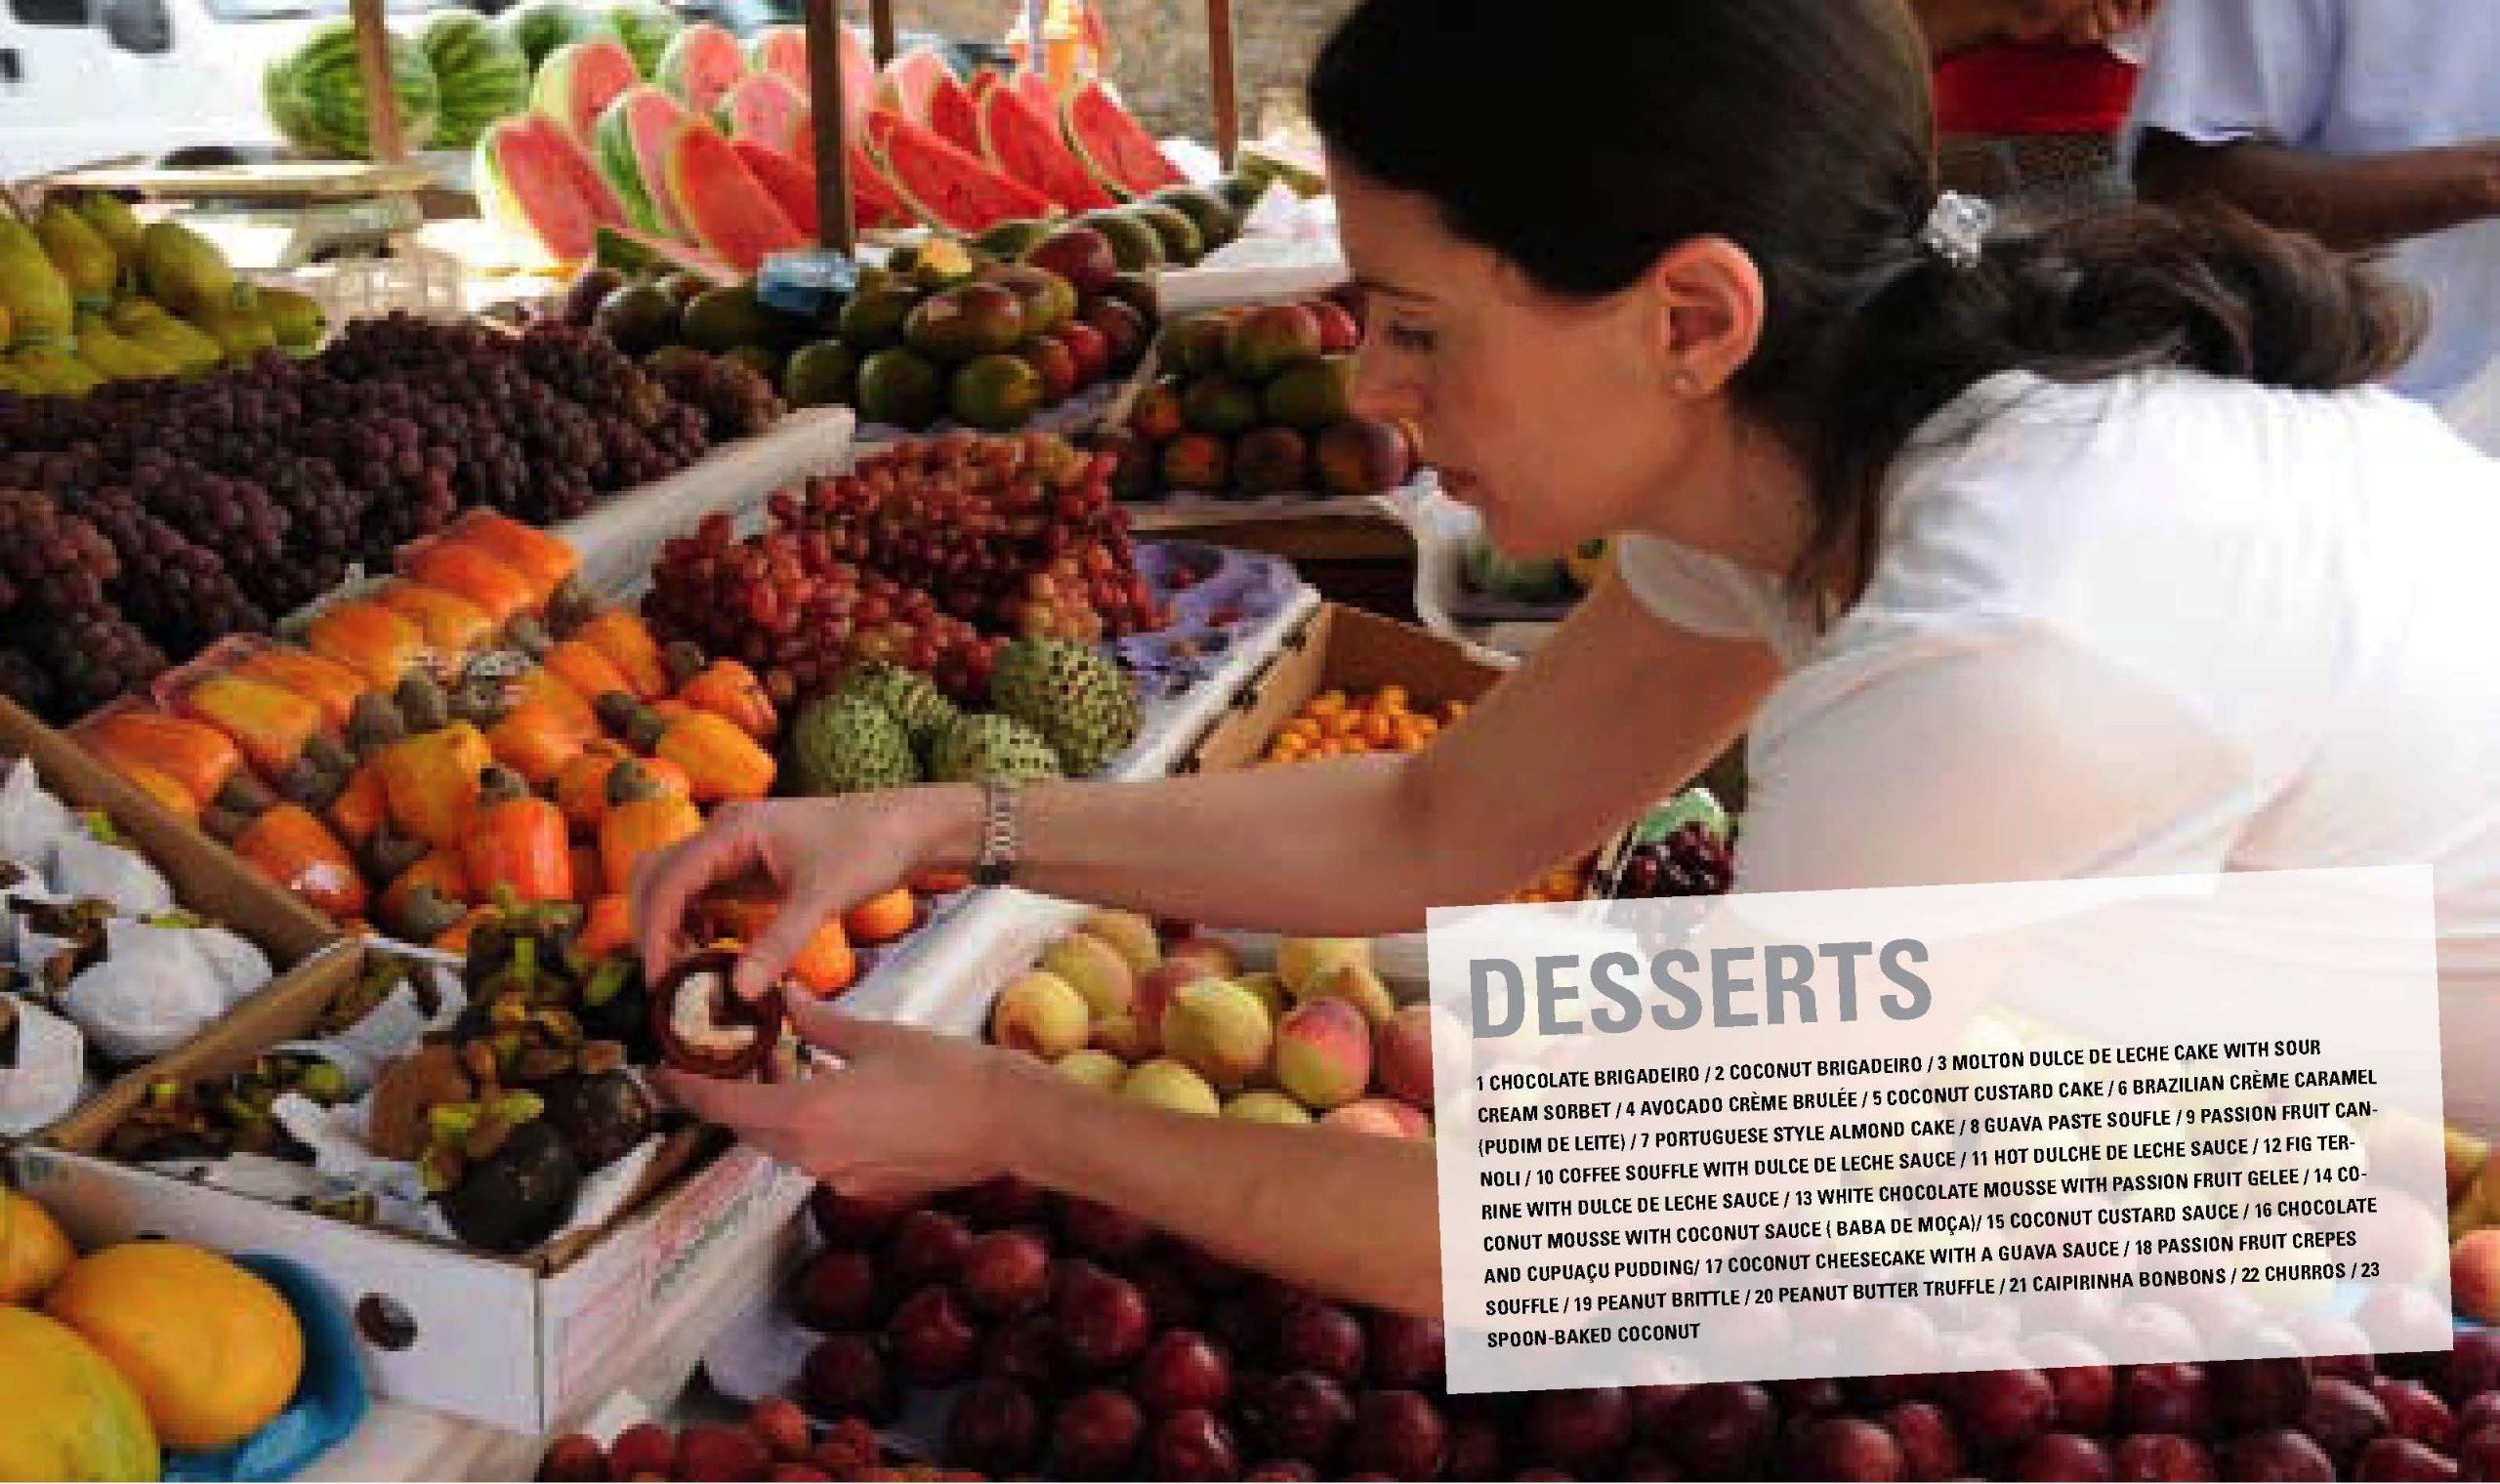 Cook Brazilian: Amazon.es: Leticia Moreinos Schwartz: Libros en idiomas extranjeros